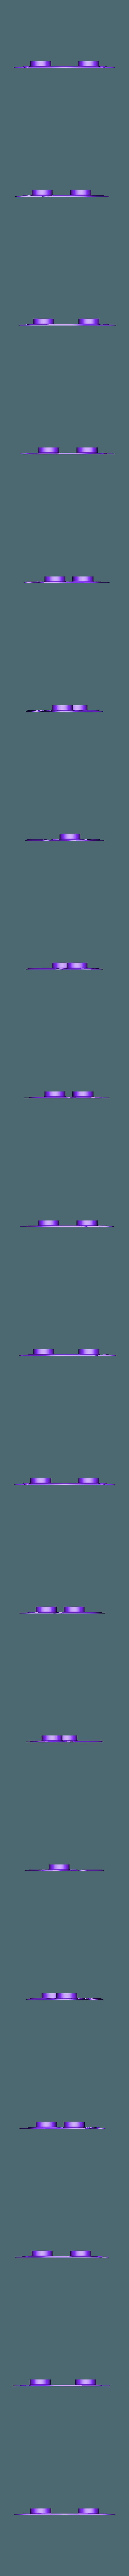 mask-kids.stl Download free STL file mask covid-19 • Model to 3D print, Creaevo3D